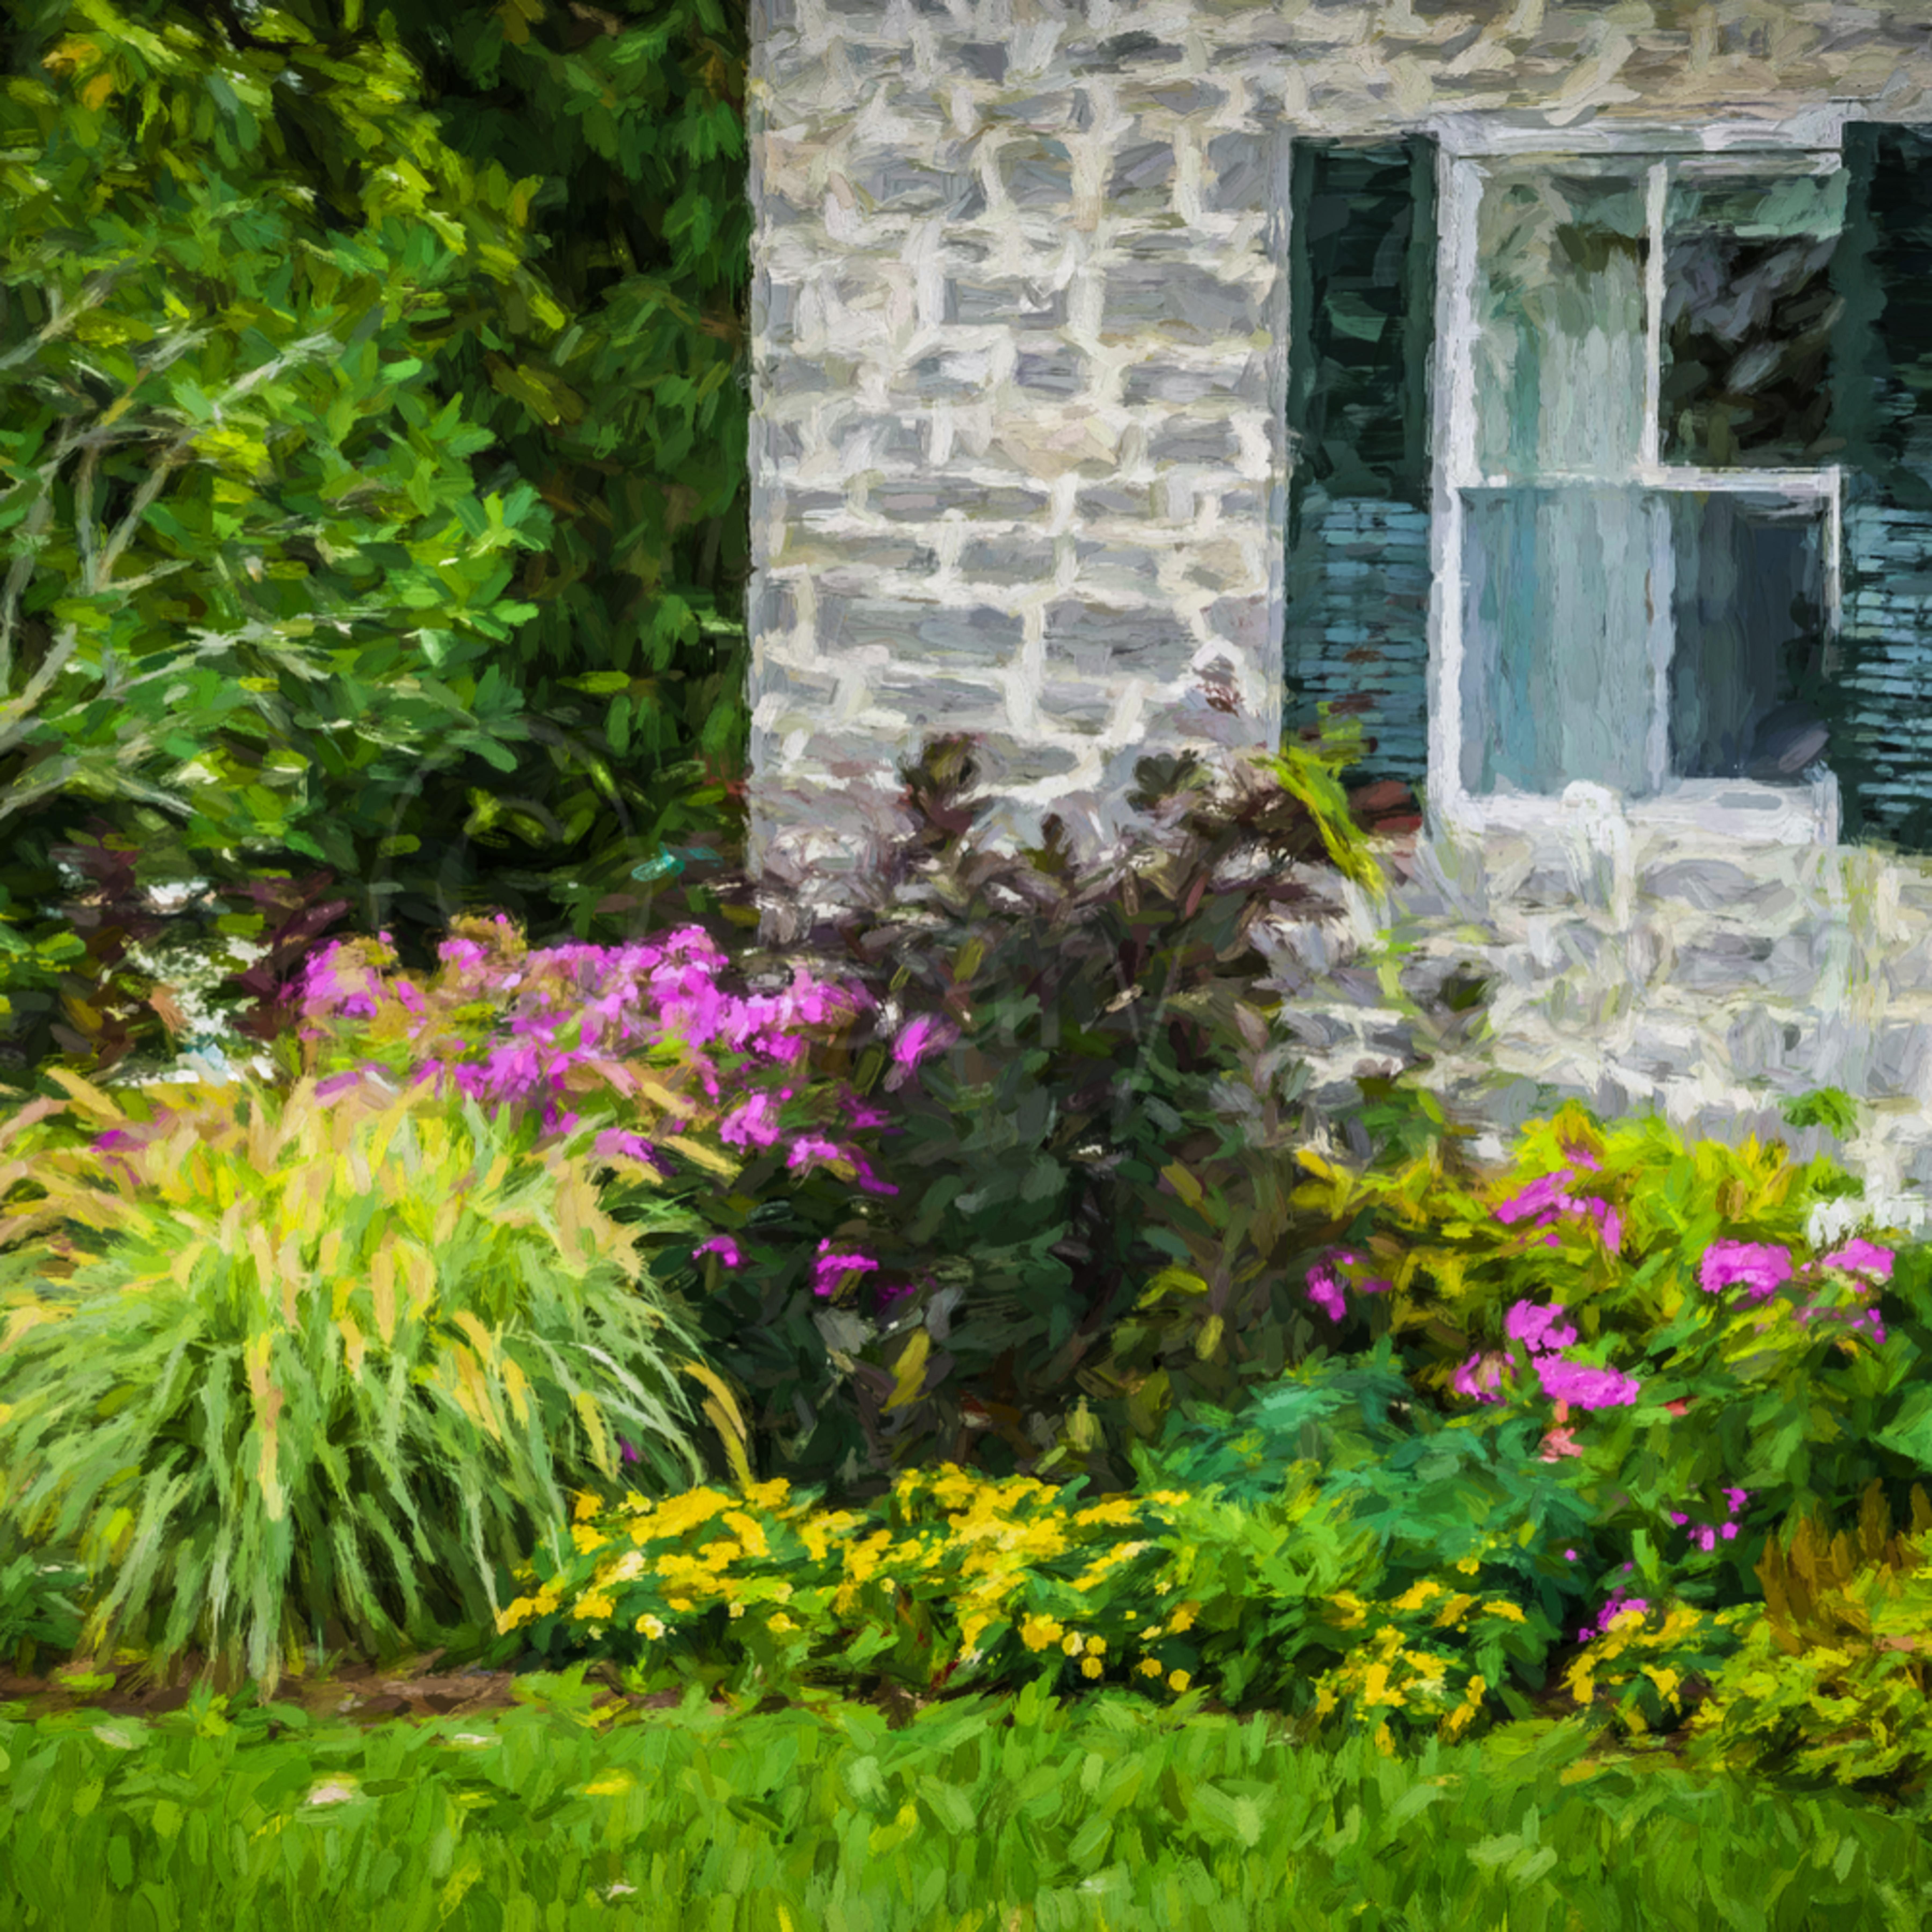 Basinharborstoneblgflowers rfnczs